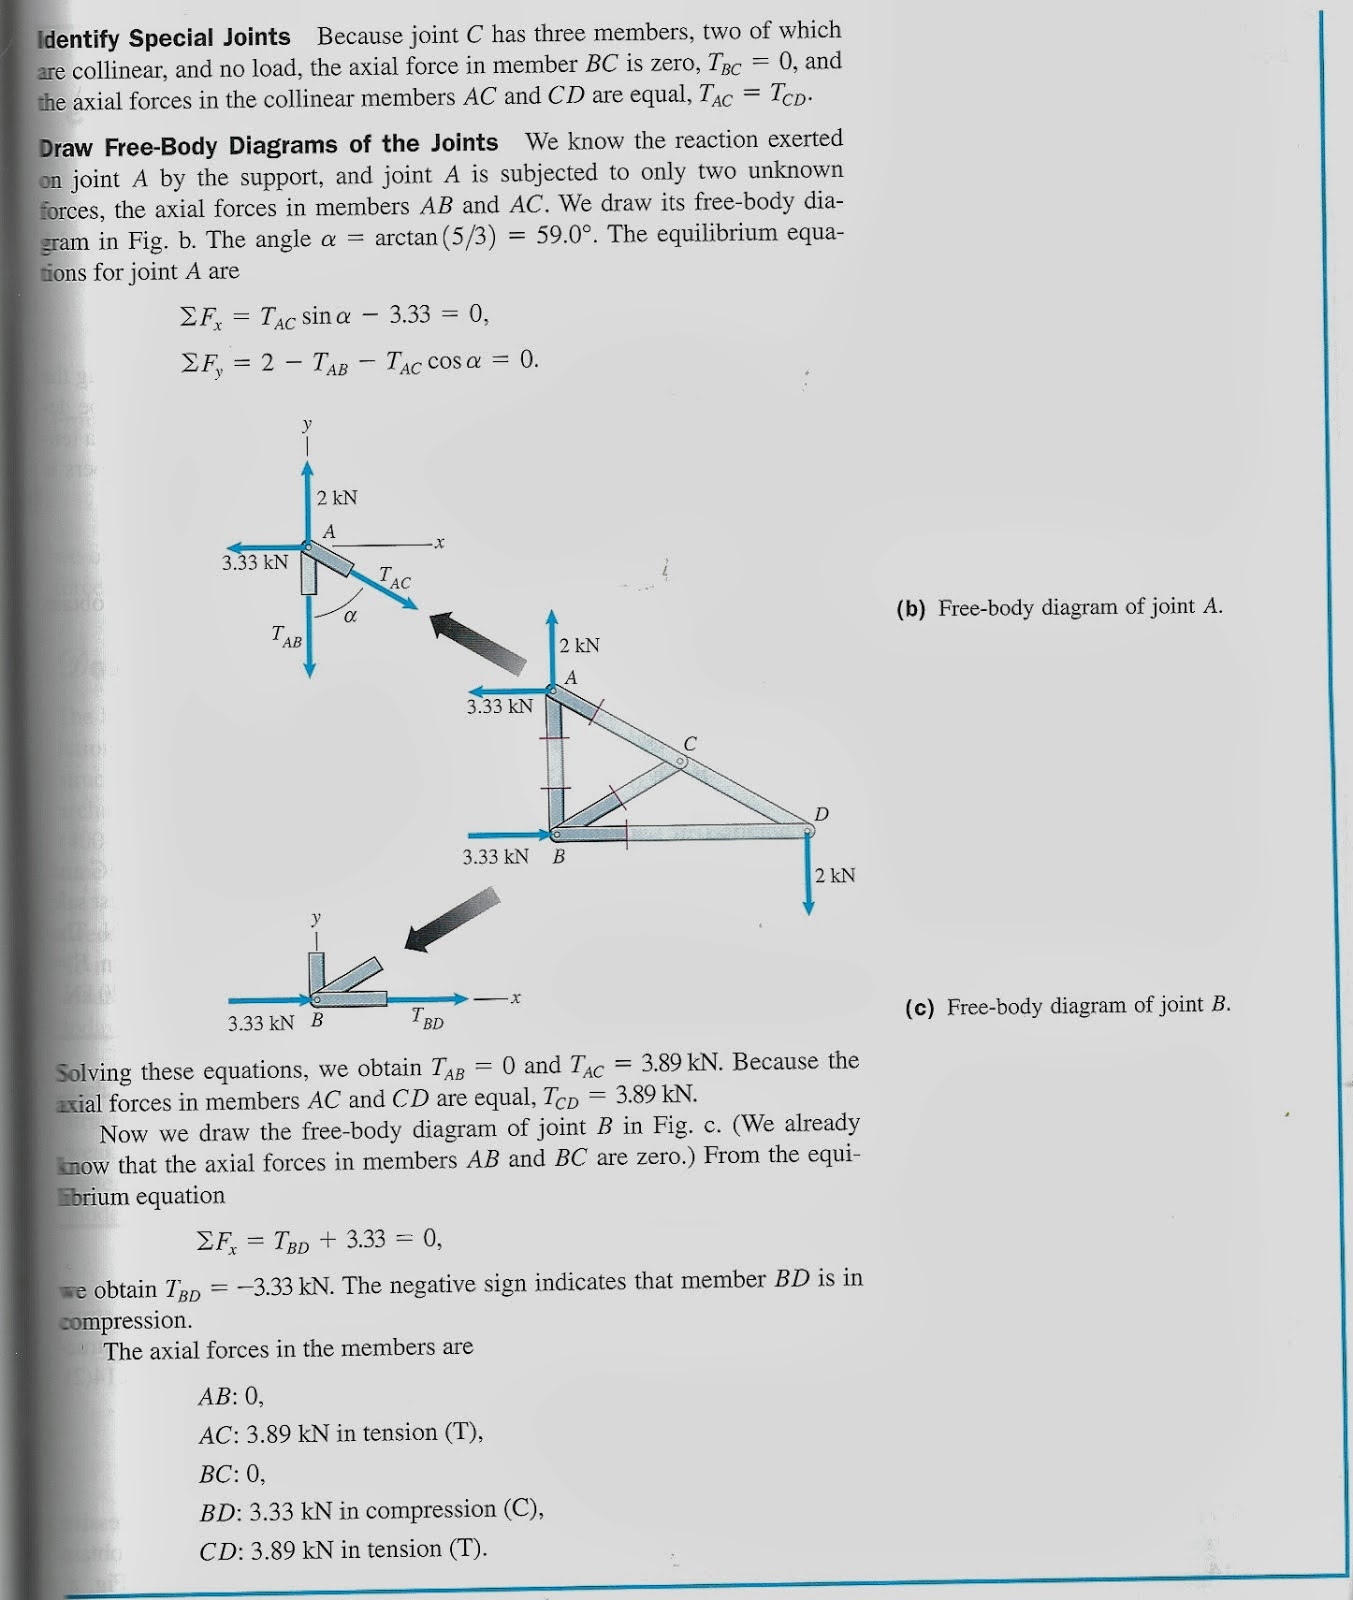 truss tension and compression diagram banshee motor engr1304 designs